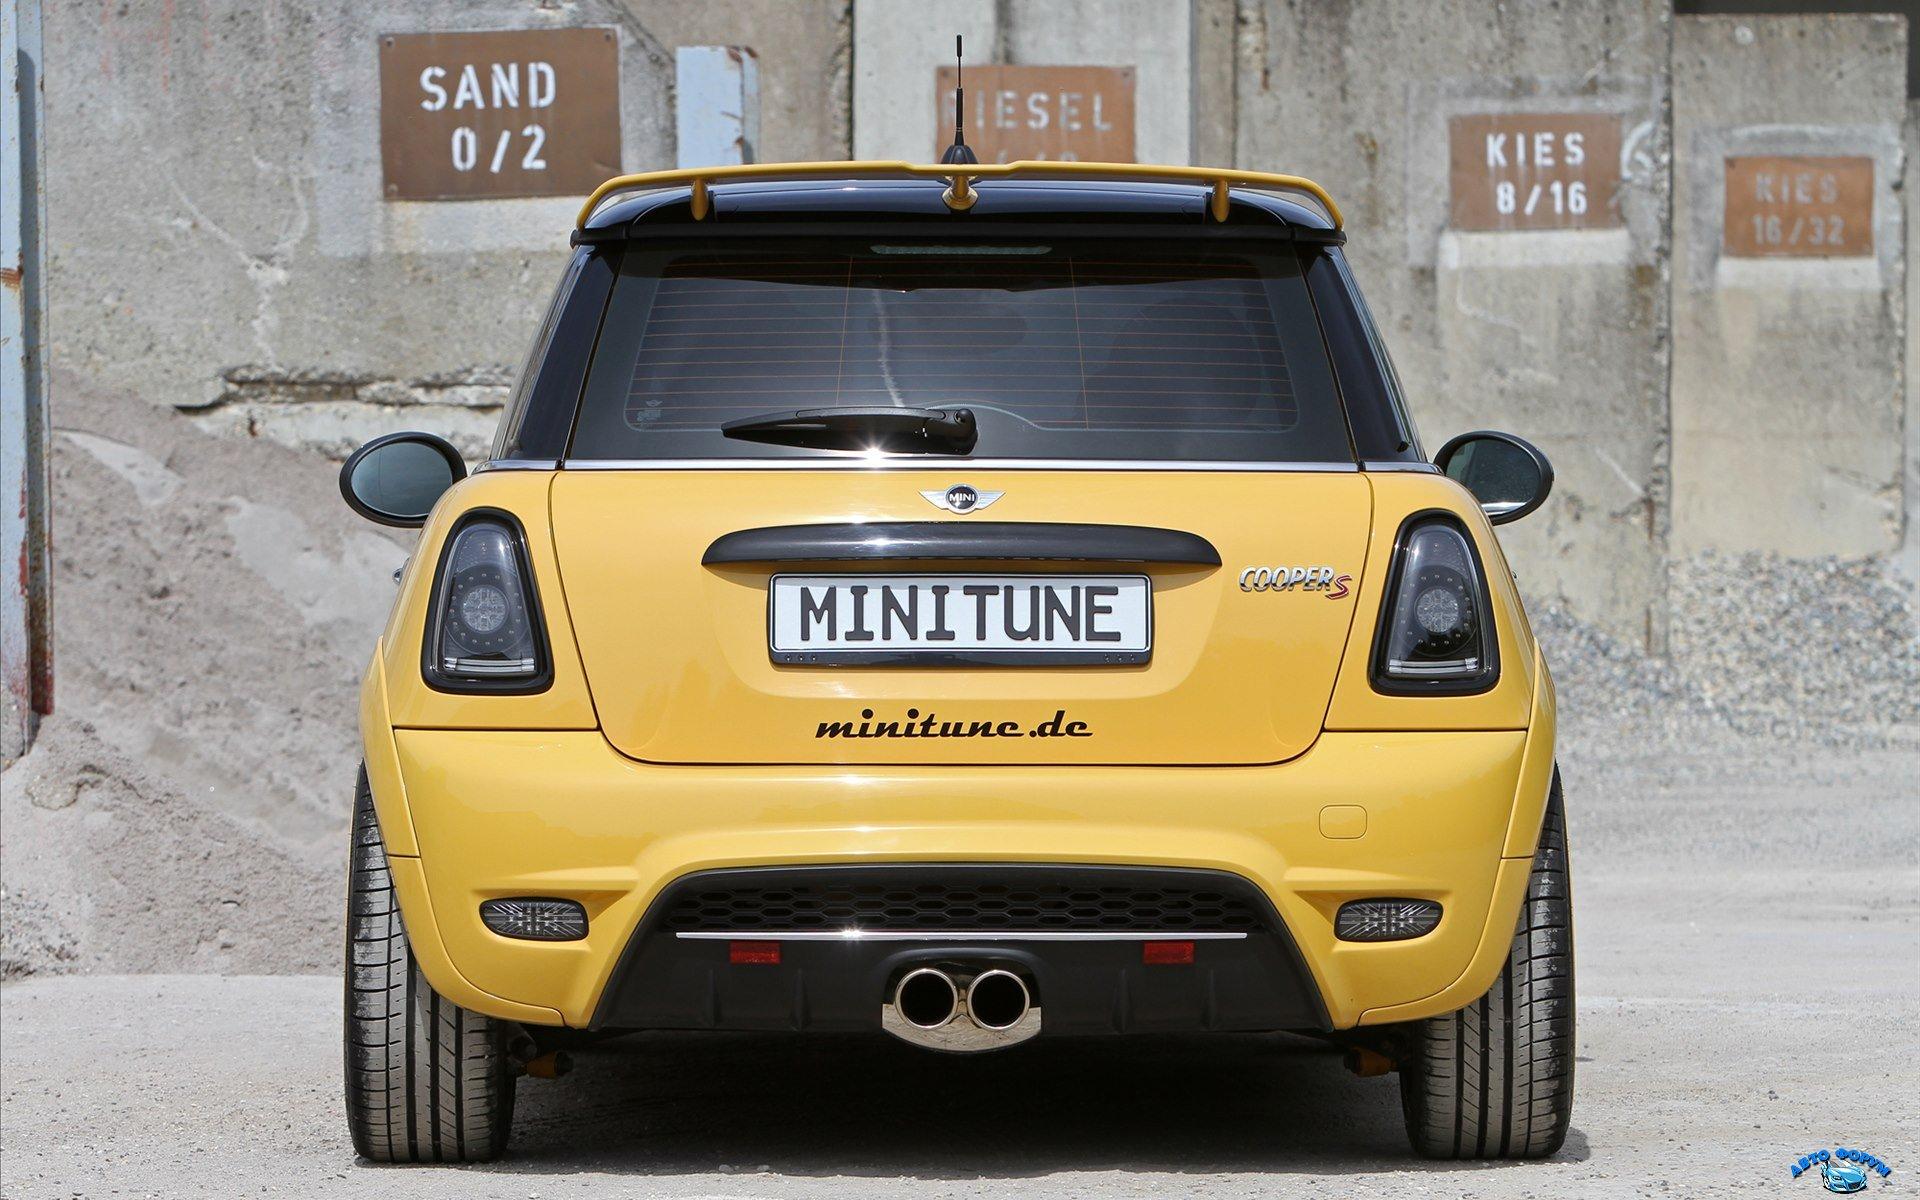 Minitune-MINI-Cooper-S-R56-2014-widescreen-01.jpg